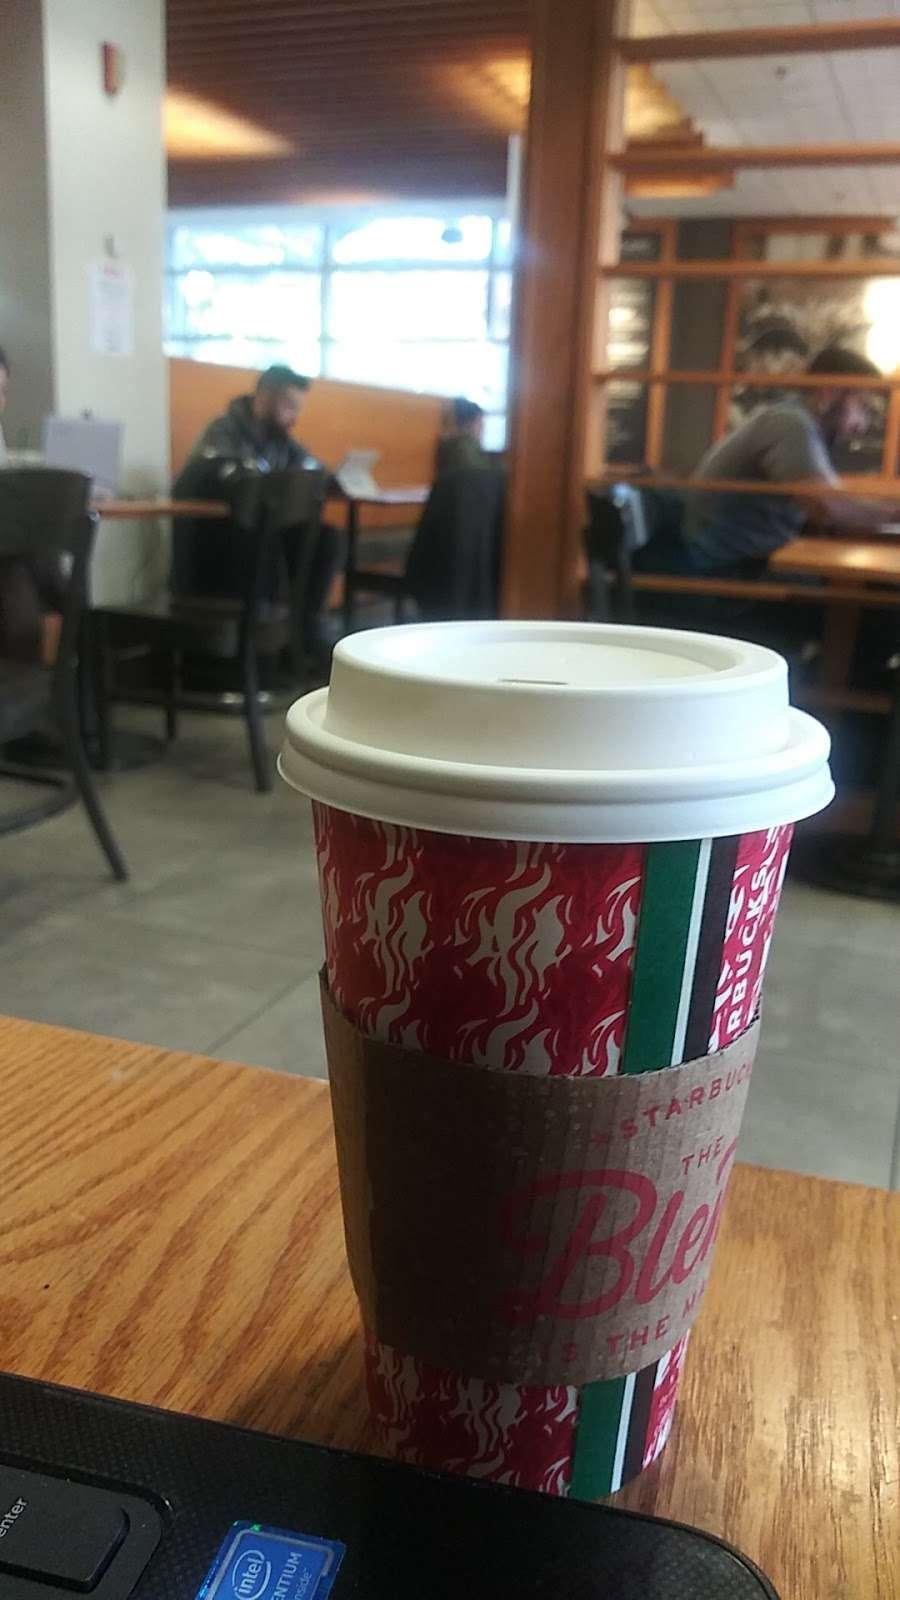 Starbucks - cafe  | Photo 2 of 10 | Address: 1000 Morris Ave, Union, NJ 07083, USA | Phone: (908) 737-4689